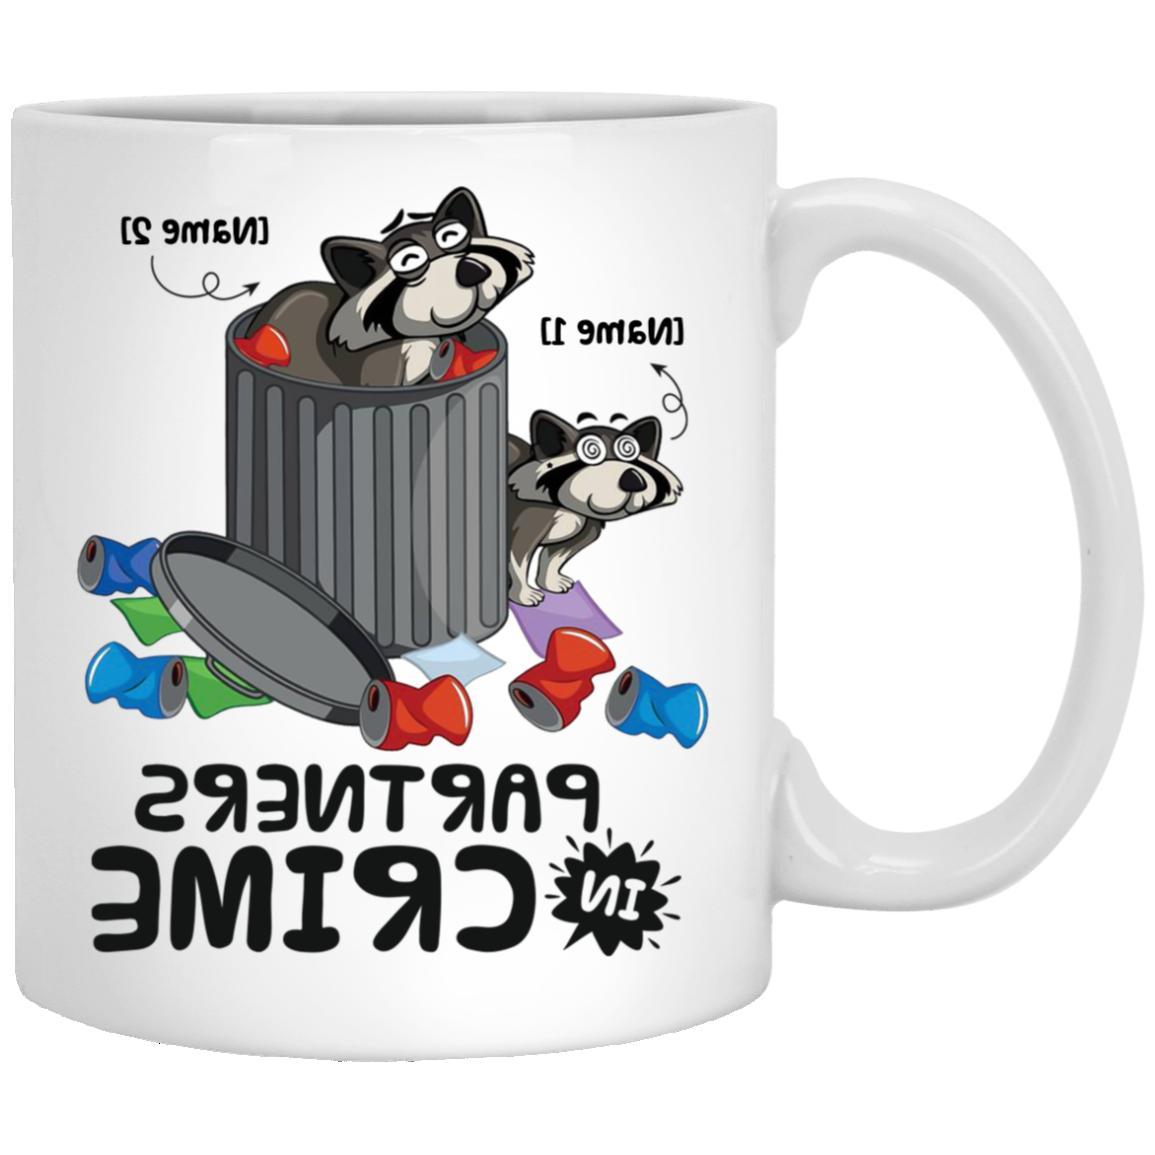 Personalized Partners In Crime Raccoon Coffee Mug – Gift f